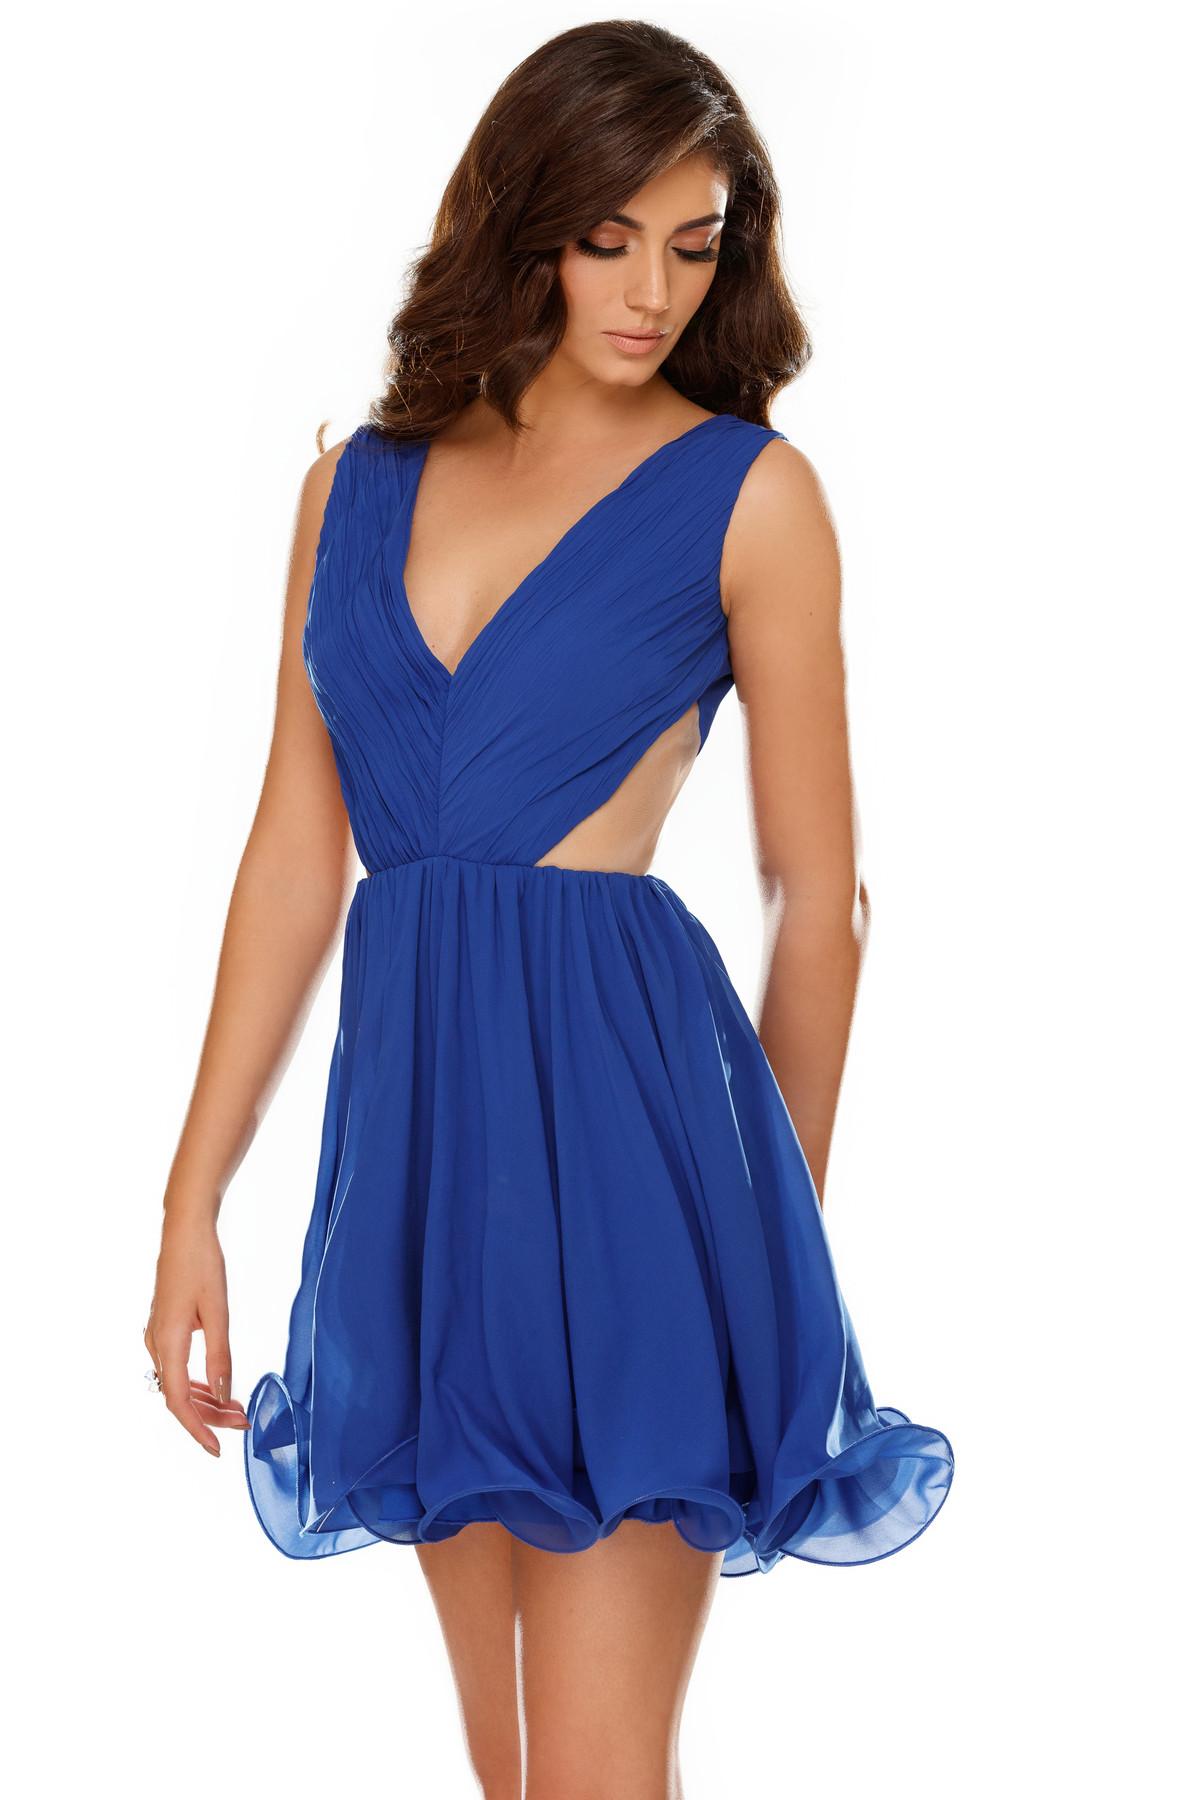 Rochie albastra de ocazie in clos din voal captusita pe interior cu spatele gol